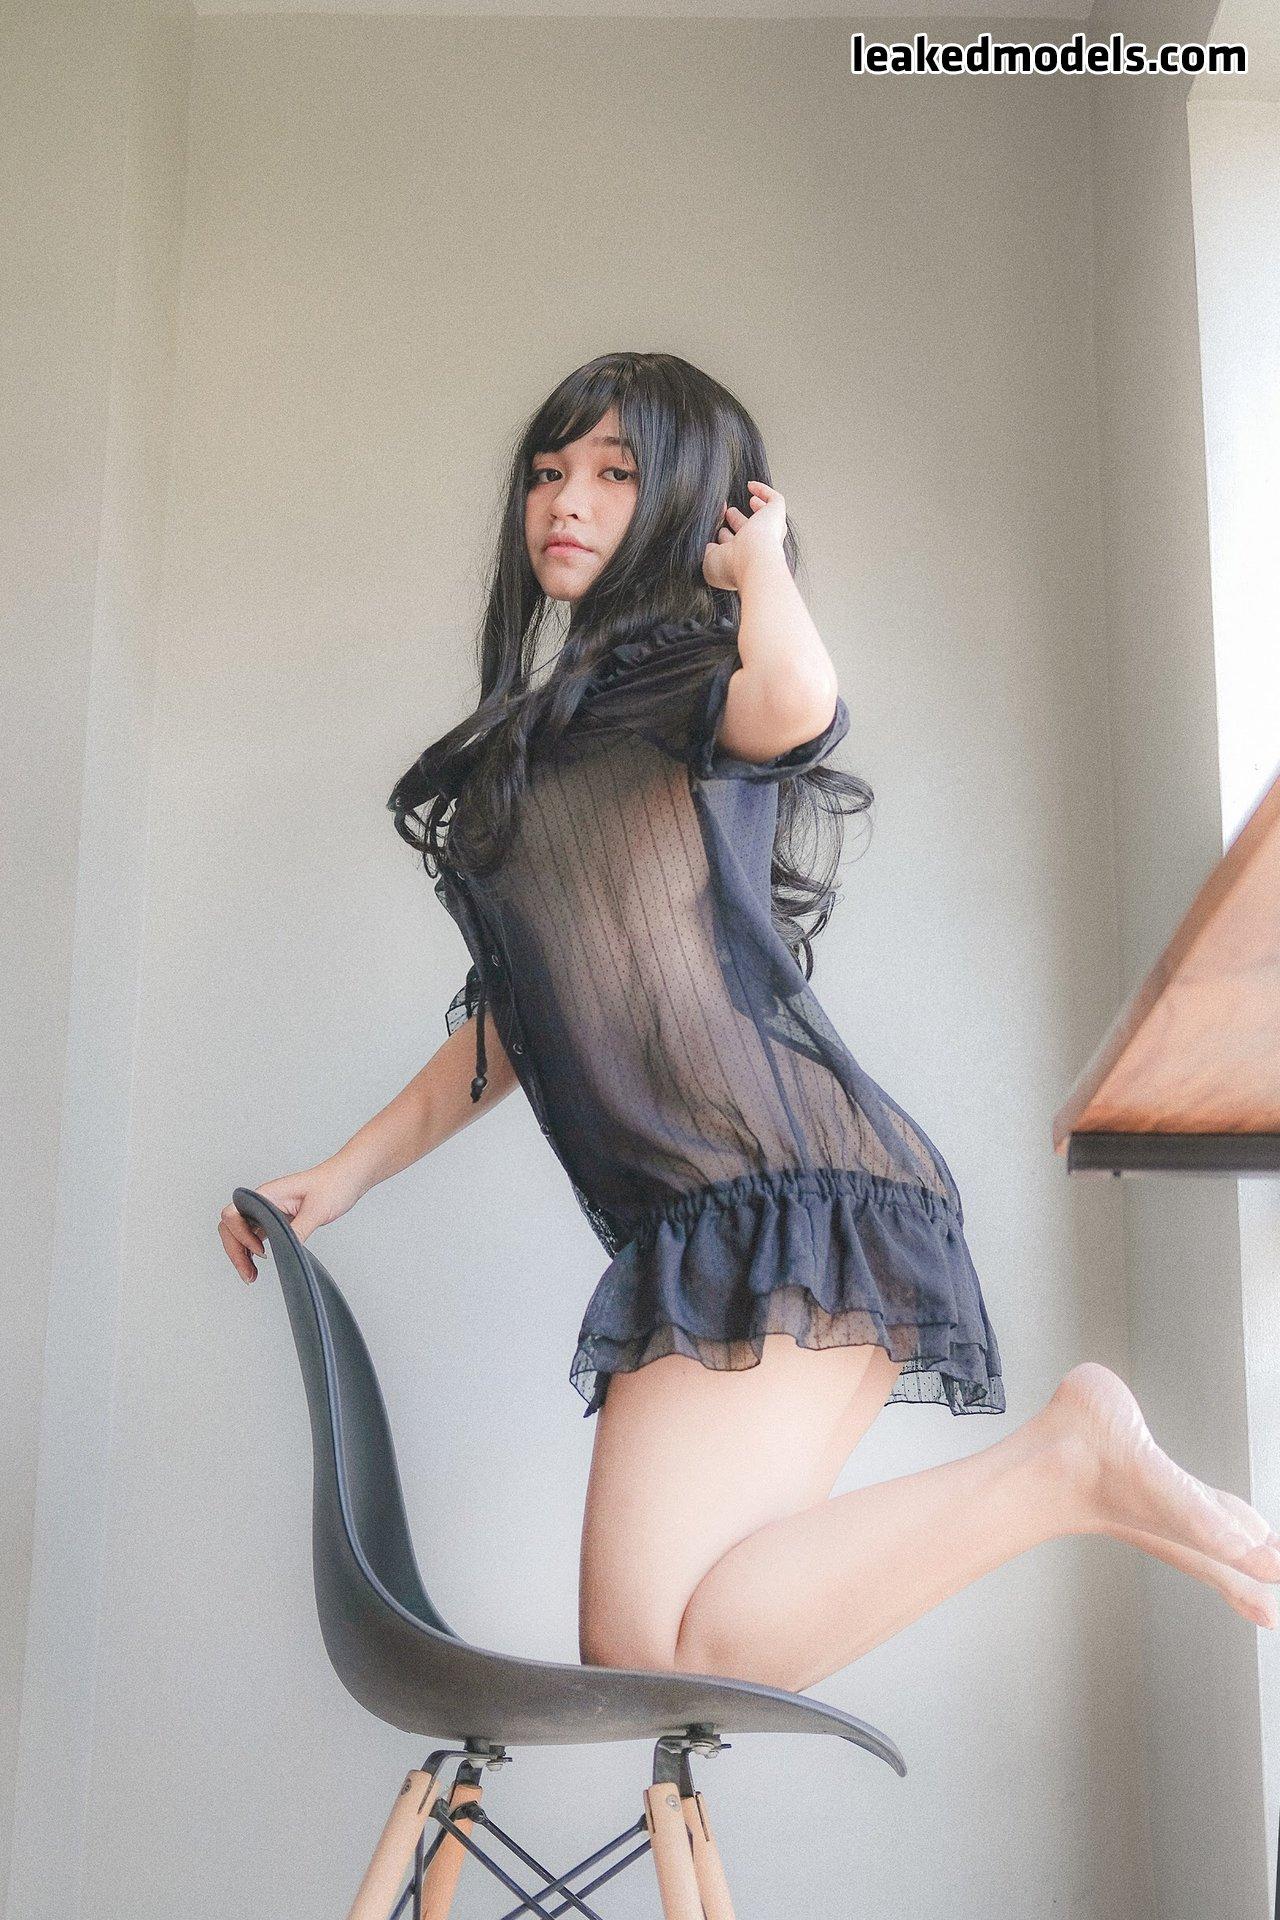 Katiecakey Instagram Sexy Leaks (27 Photos)